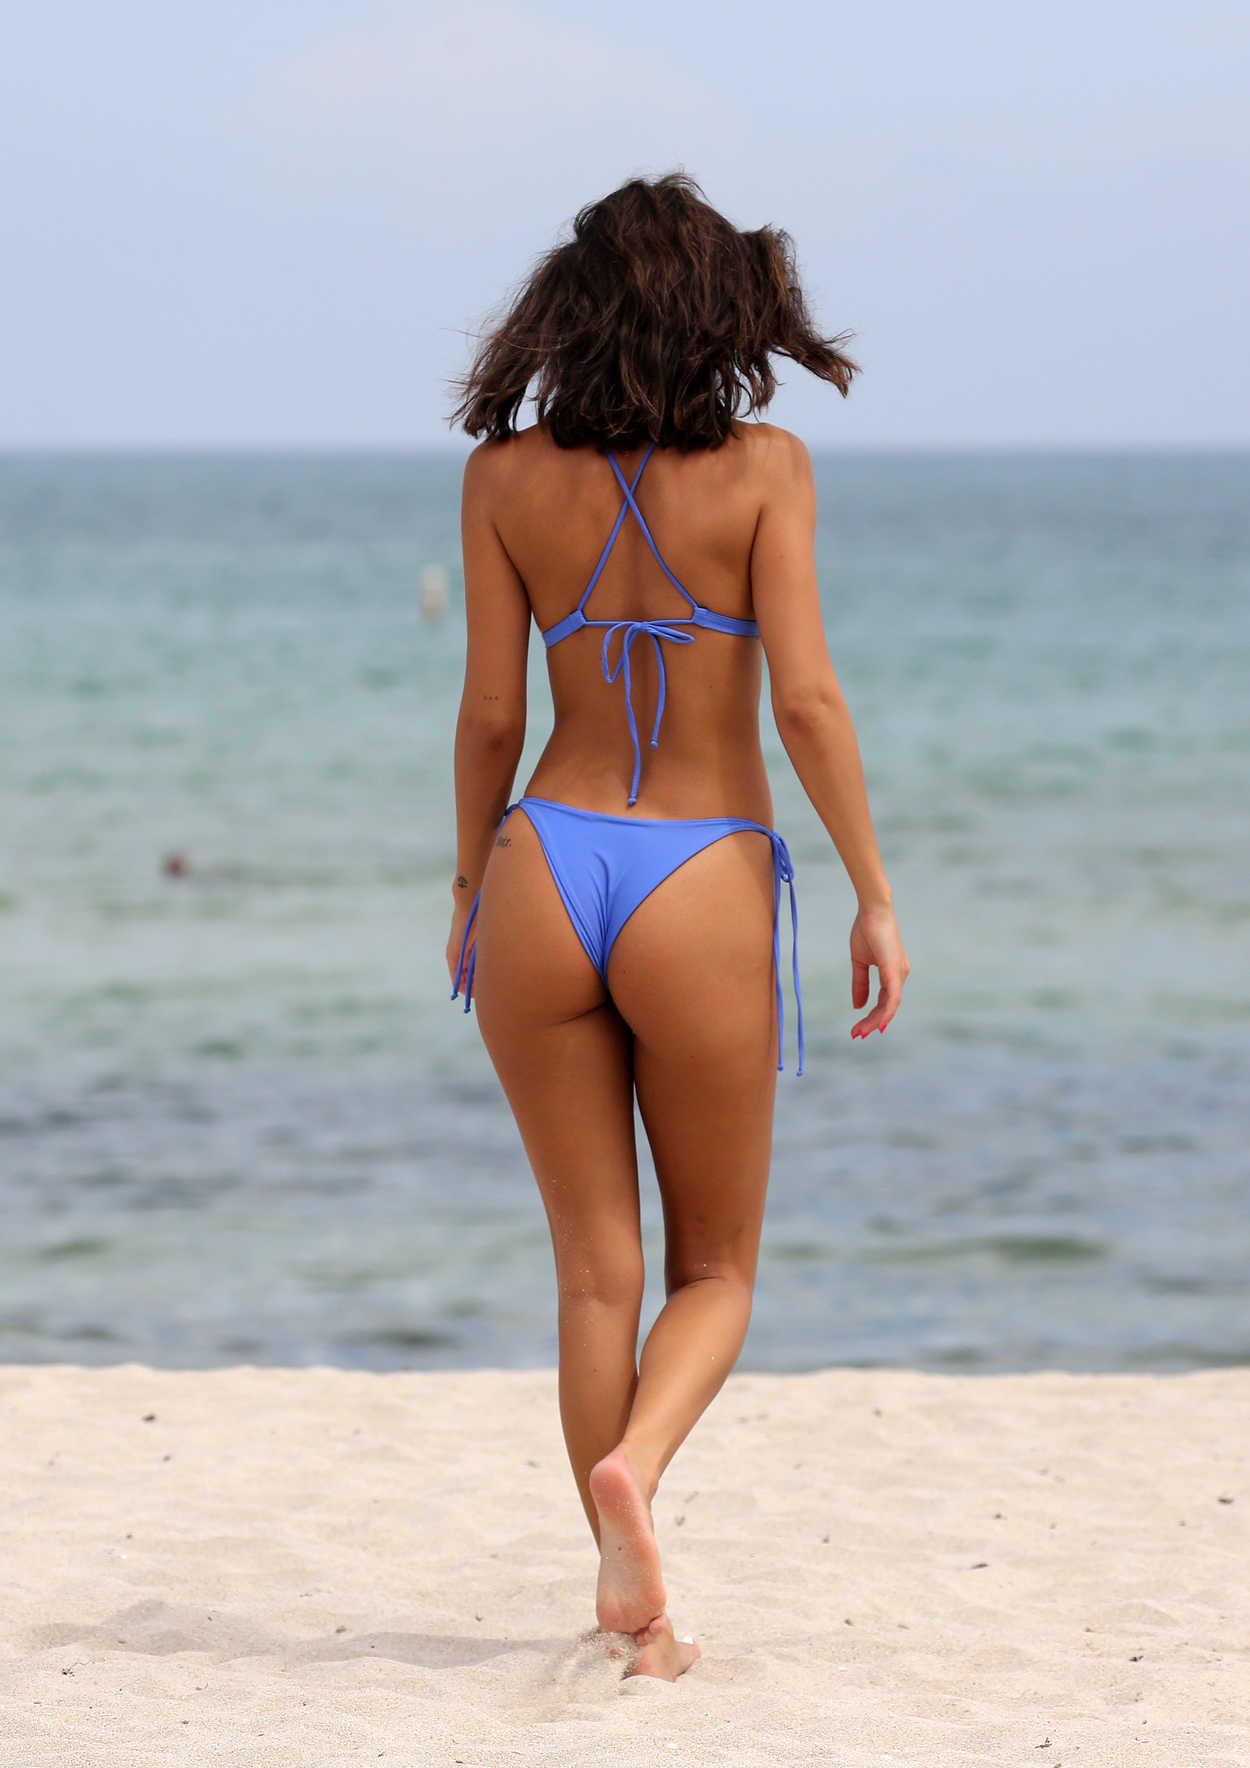 Chantel Jeffries In A Blue Bikini On The Beach In Miami 09